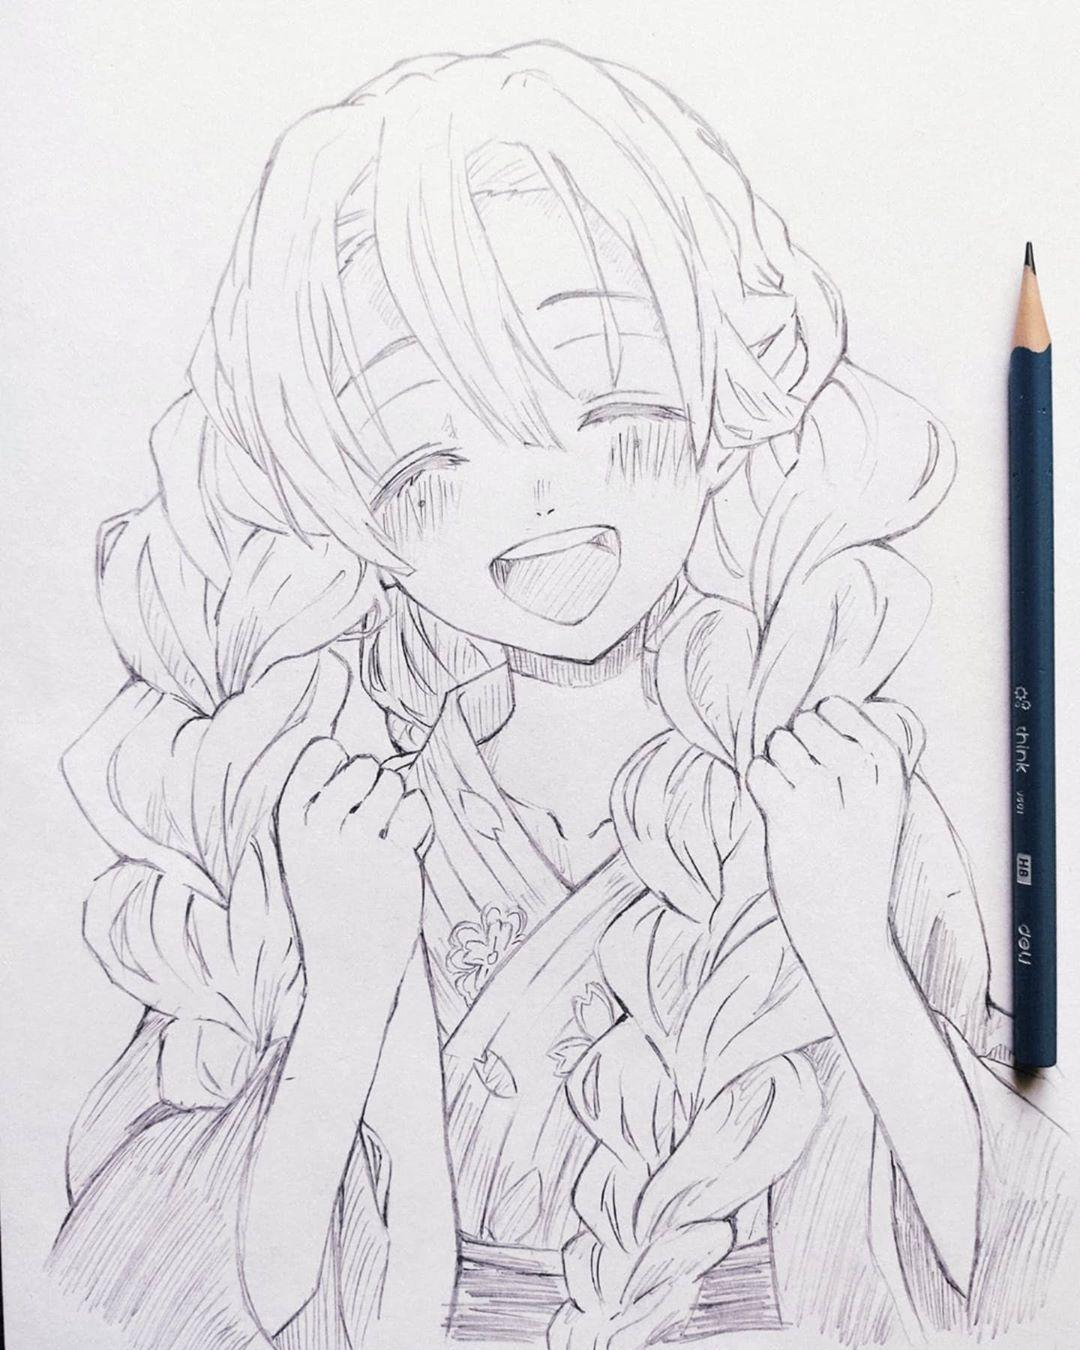 Mitsuri By Minokku Visit Our Website For More Anime And Animeart Anime Animesketch Tanjirou Nezuku M Anime Lineart Otaku Art Anime From which folder should i print? anime animesketch tanjirou nezuku m